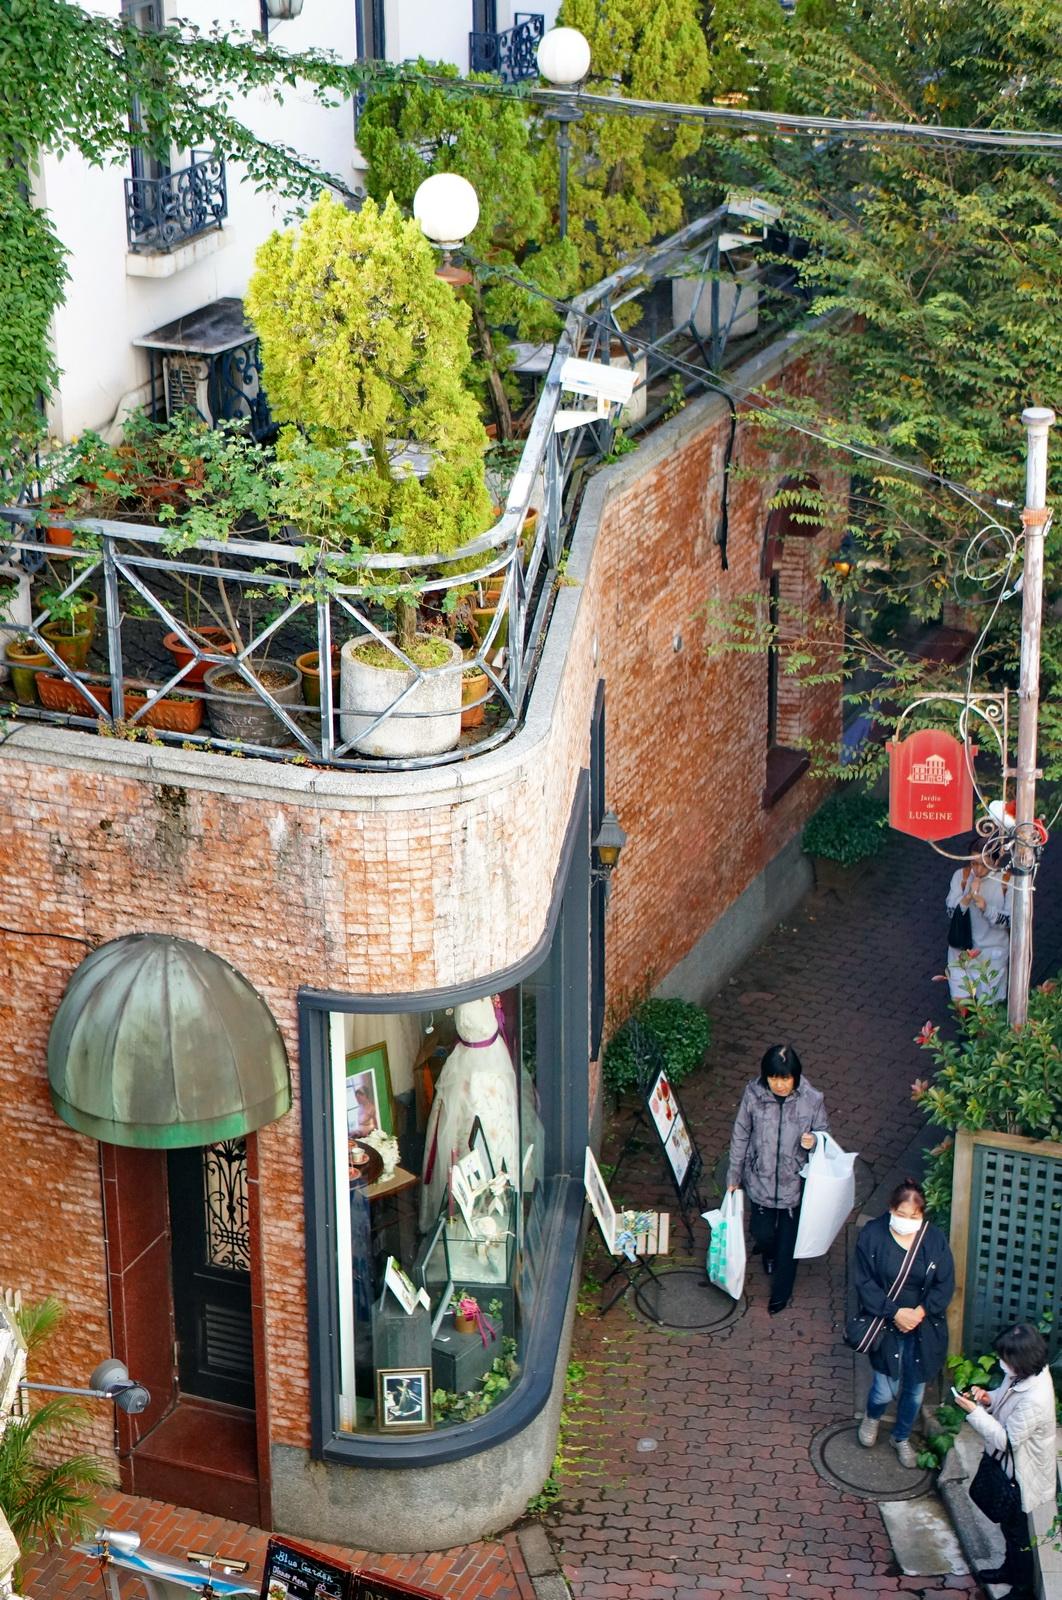 jardin de luseine, takeshita-dori, takeshita street, tokyo city guide, tokyo, japan, japan trip, street life, japon, voyage au japon